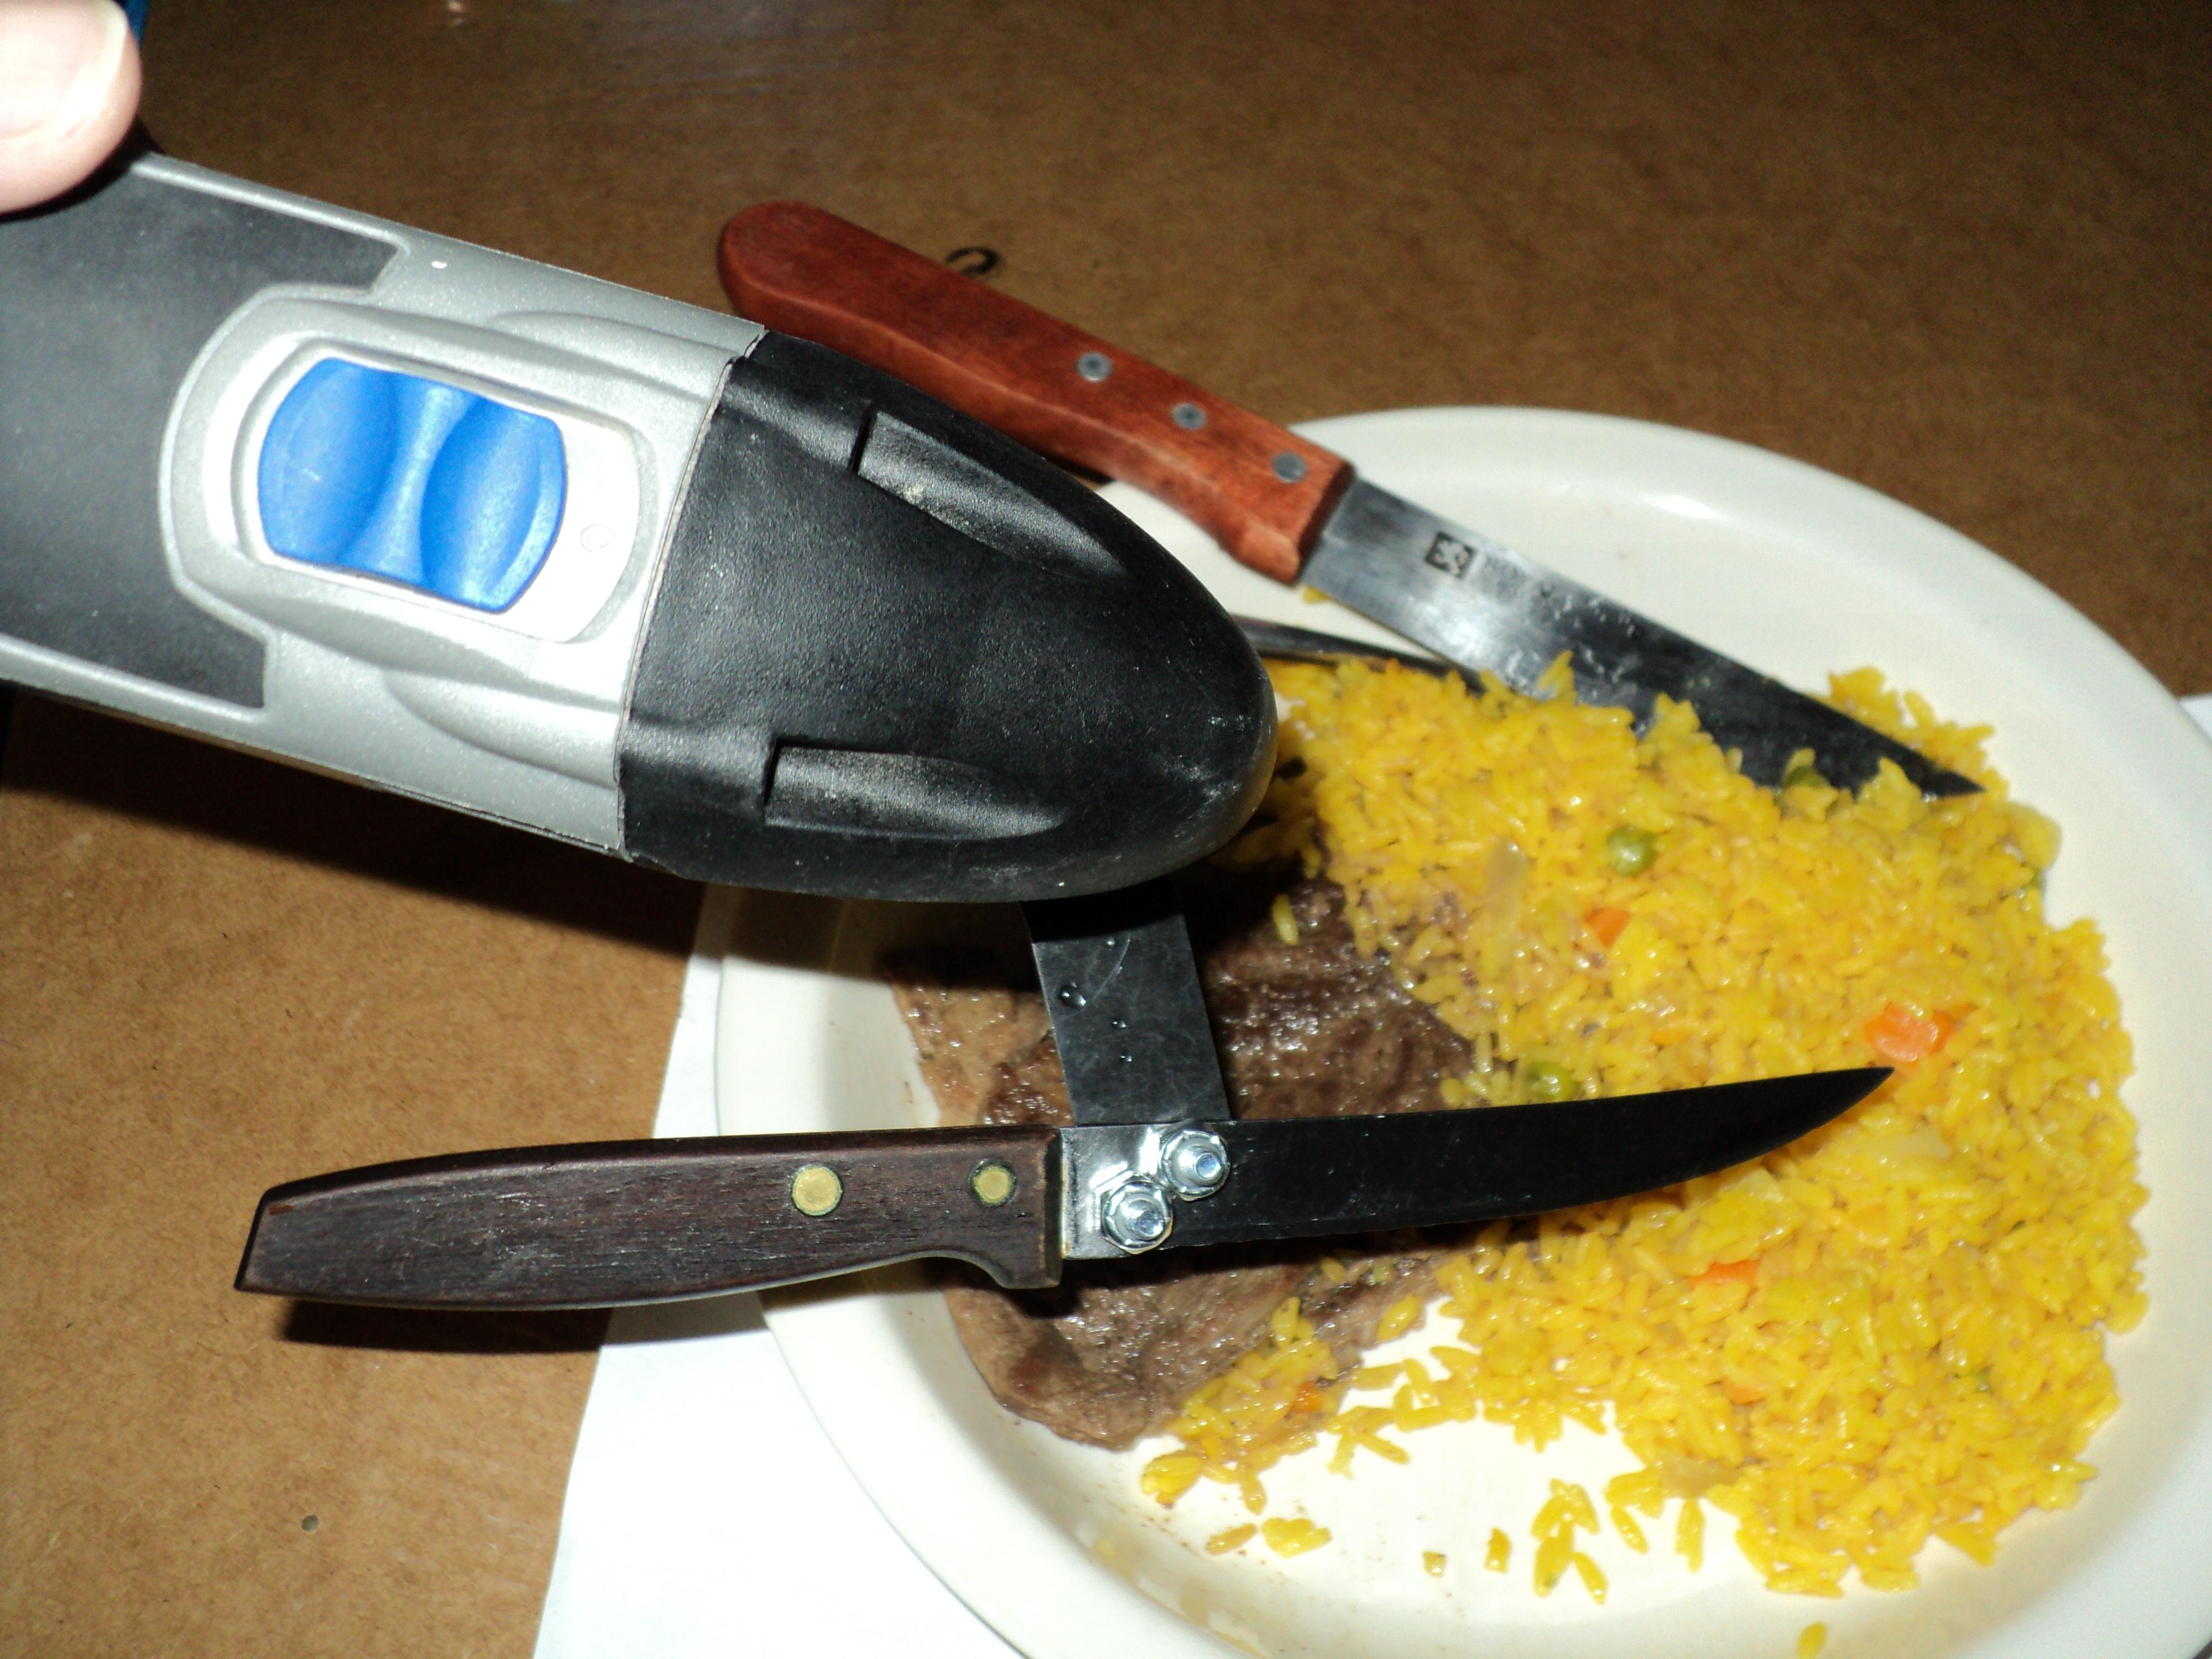 Oscillating Tool Steak Carving Knife